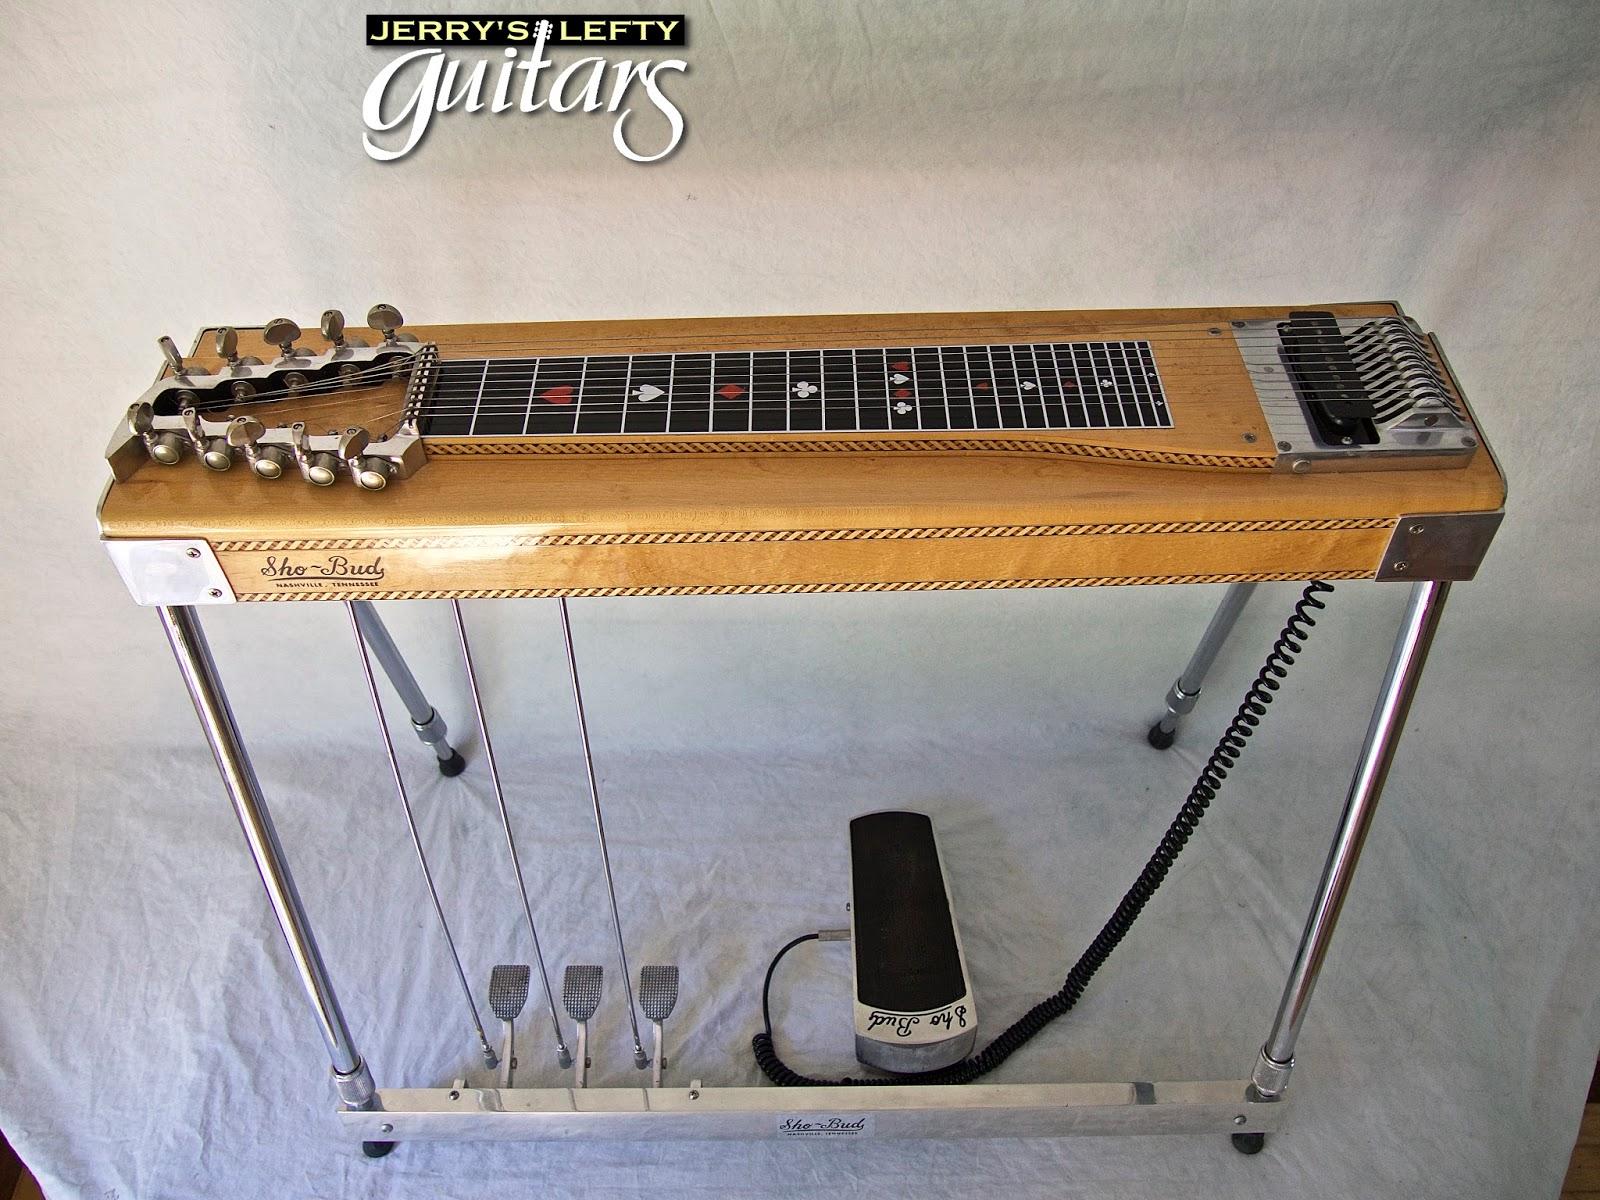 jerry 39 s lefty guitars newest guitar arrivals updated weekly 1971 sho bud pedal steel left. Black Bedroom Furniture Sets. Home Design Ideas